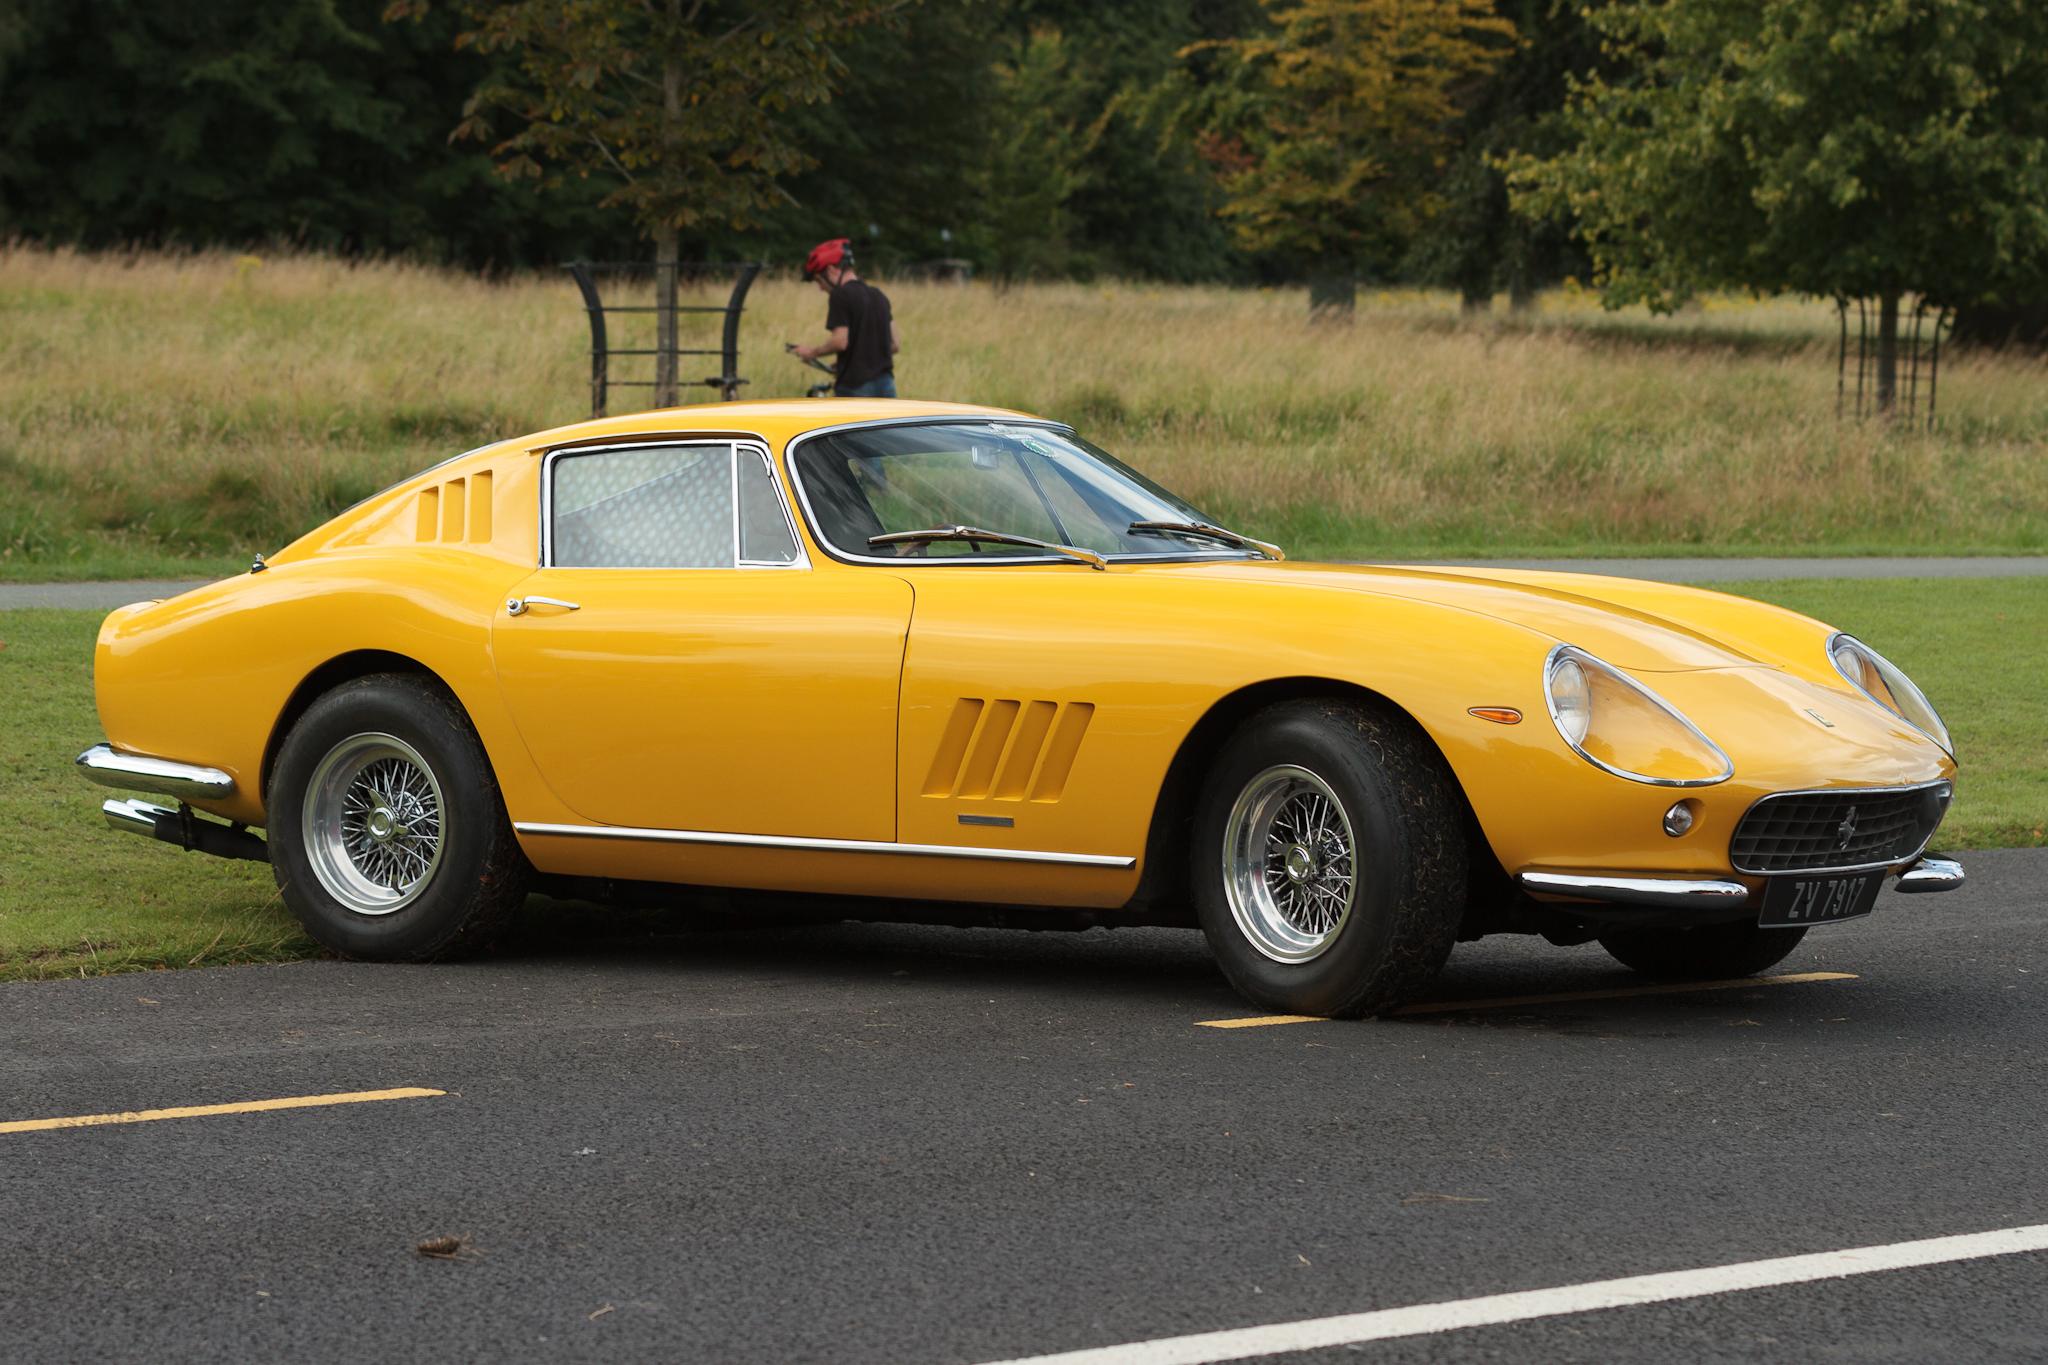 File:1965 Ferrari 275.jpg - Wikimedia Commons